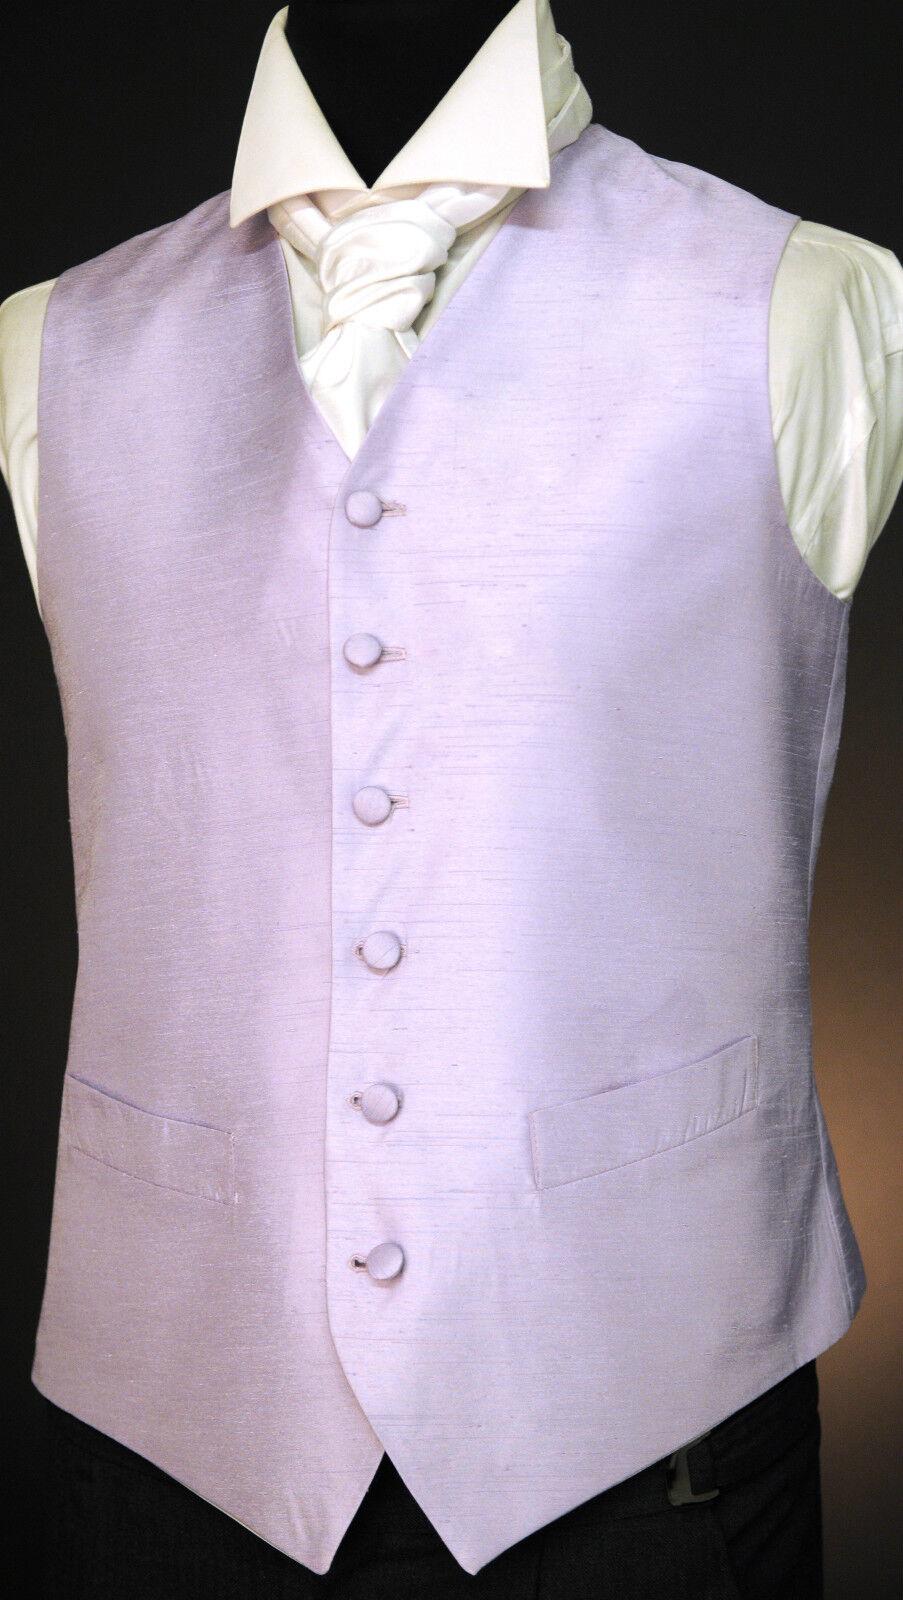 Solid Lilac Dupion waistcoat - wedding / dress / suit / party W - 463.